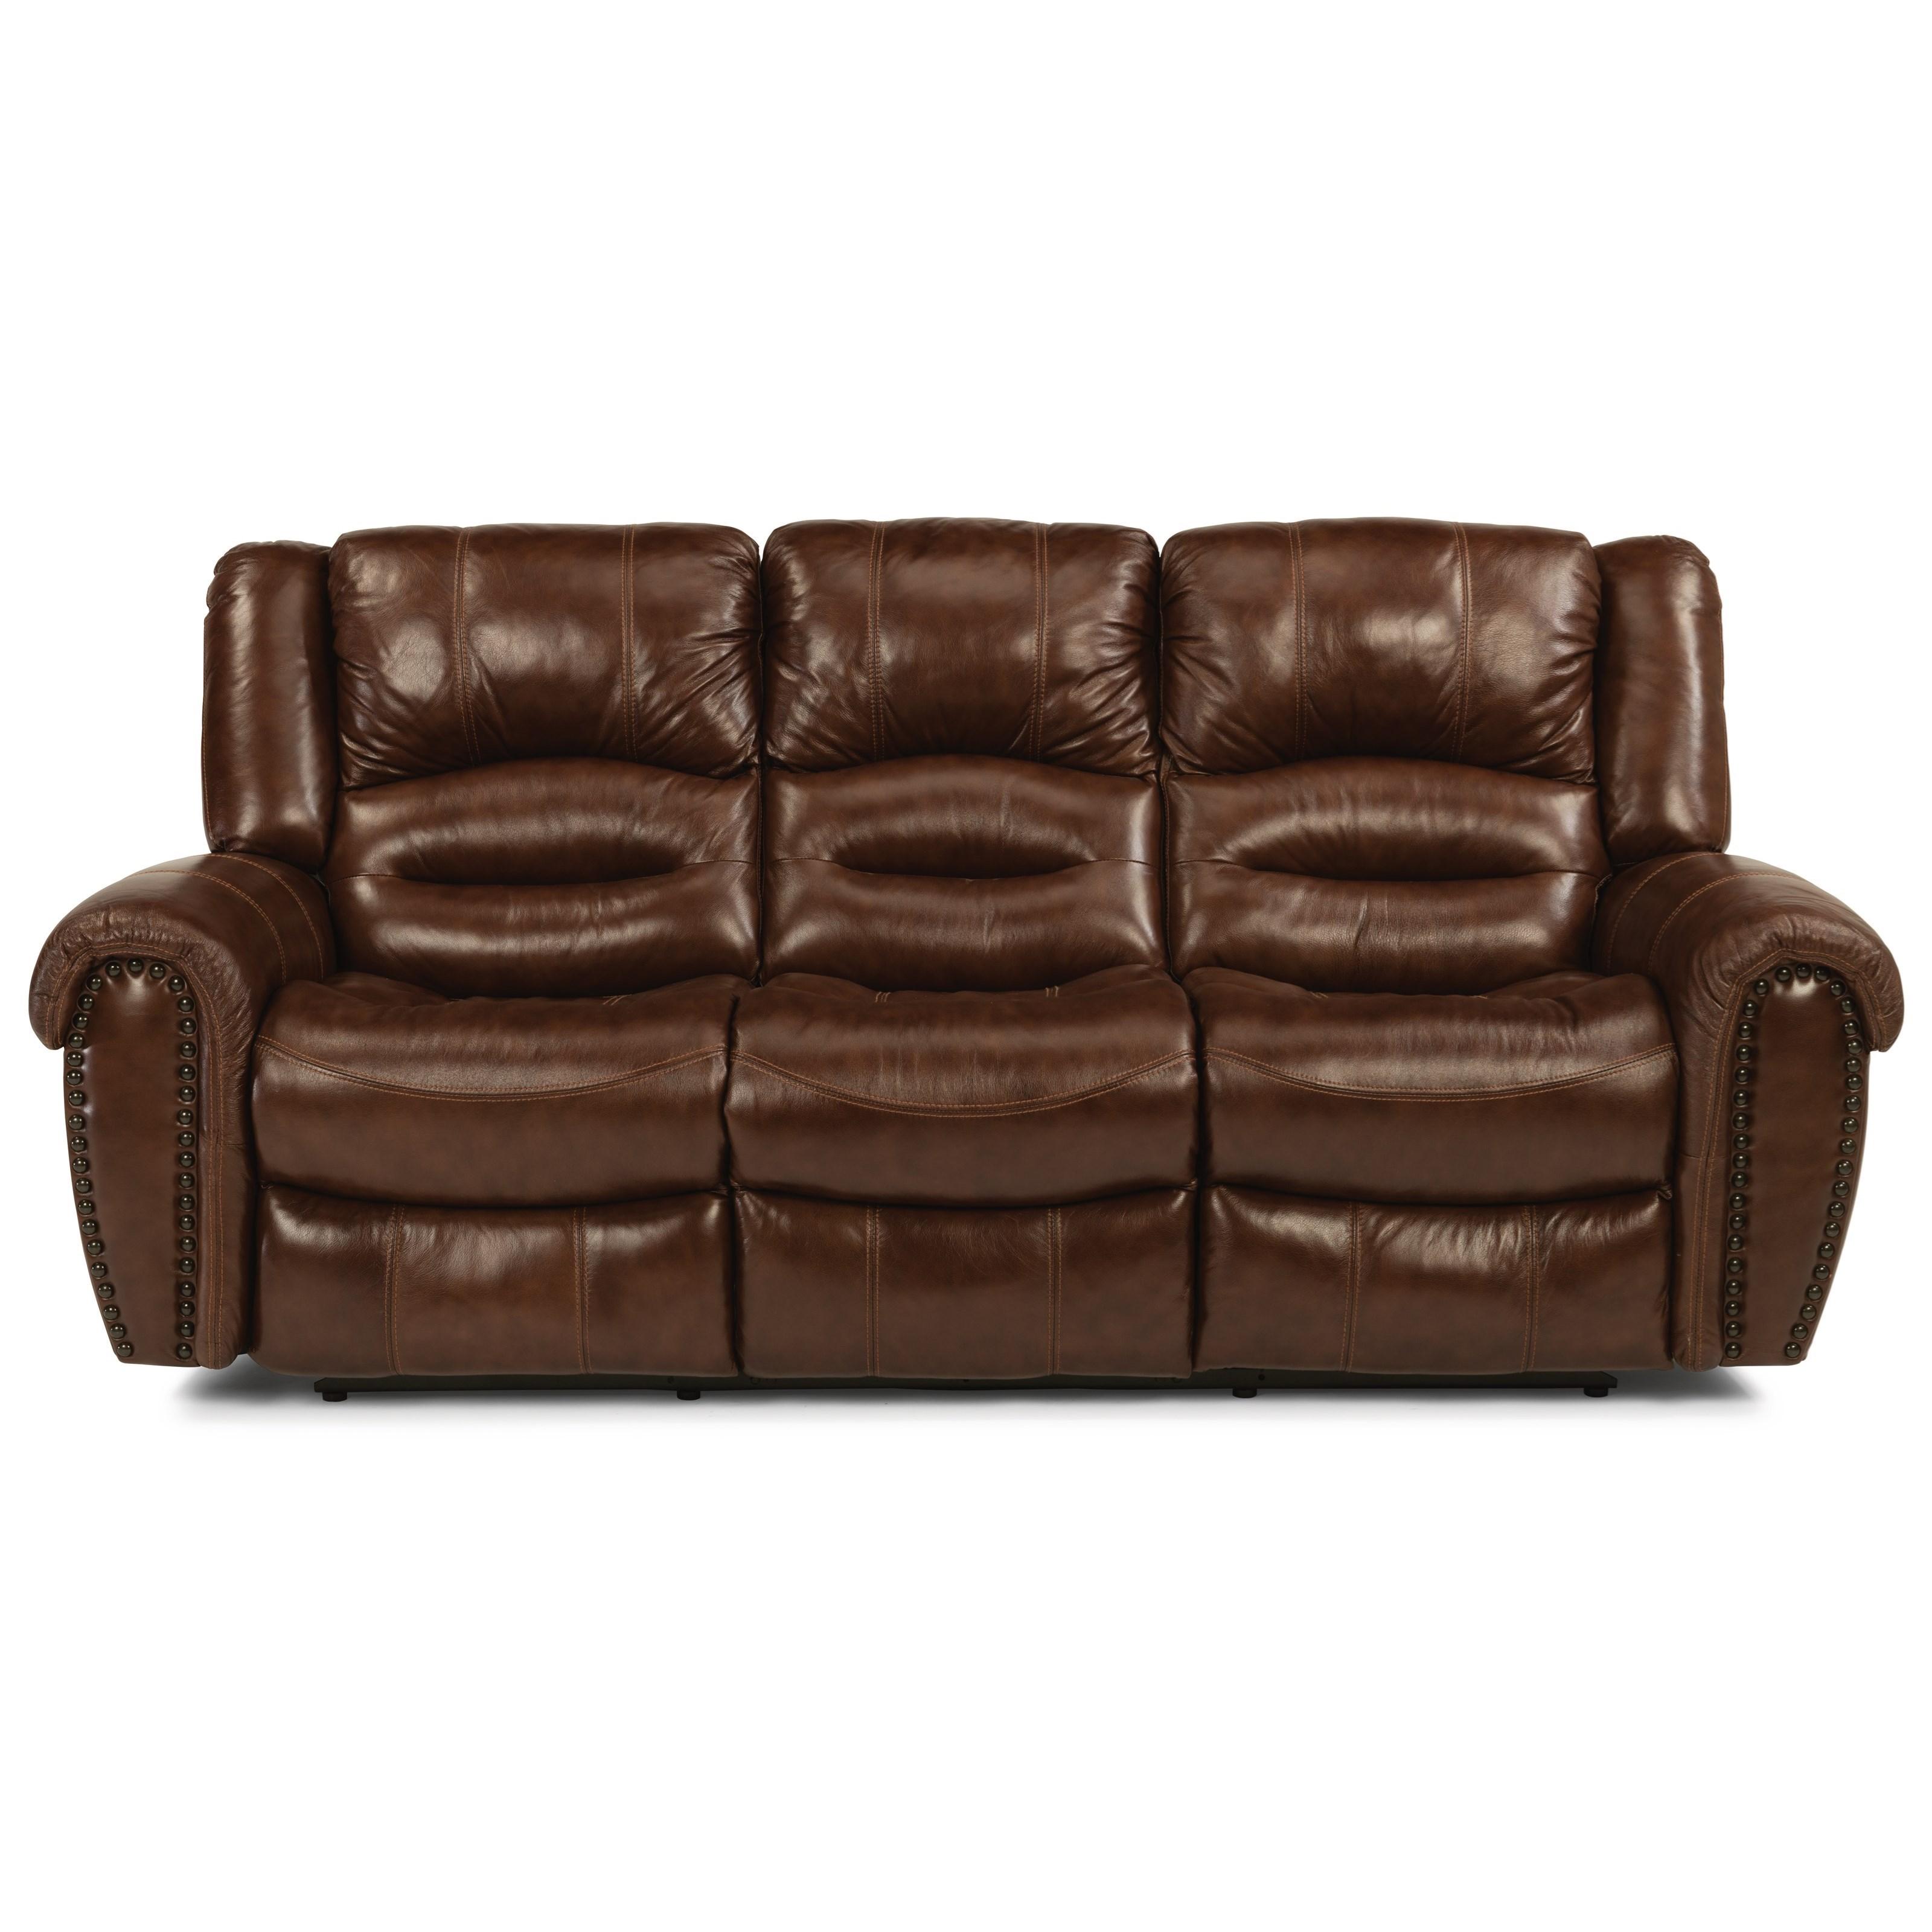 Latitudes - Town Power Reclining Sofa by Flexsteel at Johnny Janosik